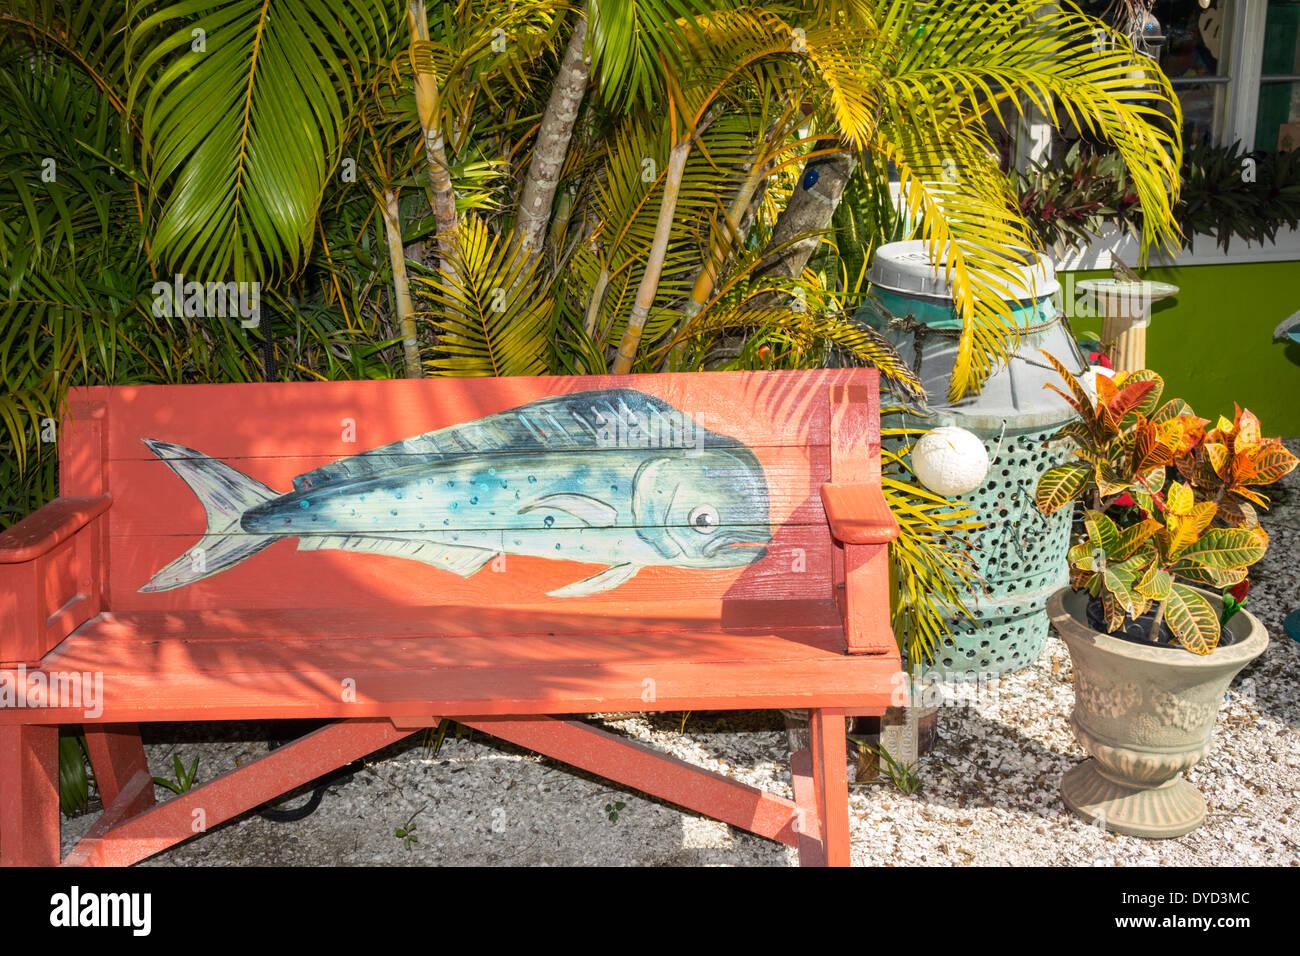 Port Charlotte Florida Harbor Placida Art Market sign Hatch Gallery shopping exterior colorful bench - Stock Image